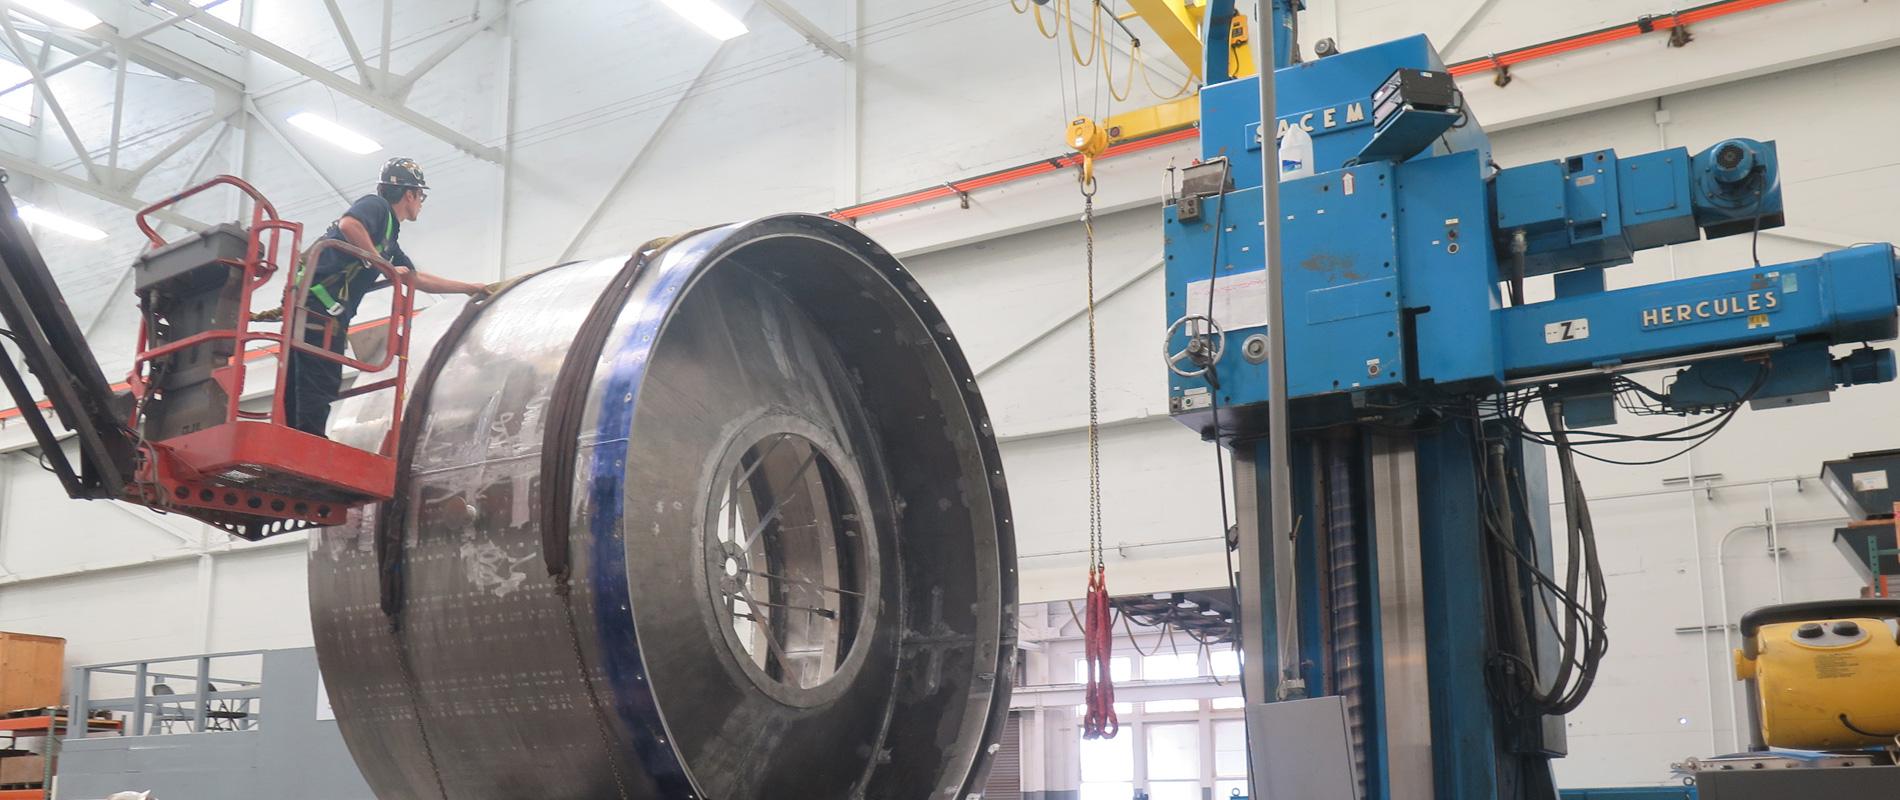 One-stop metal fabrication